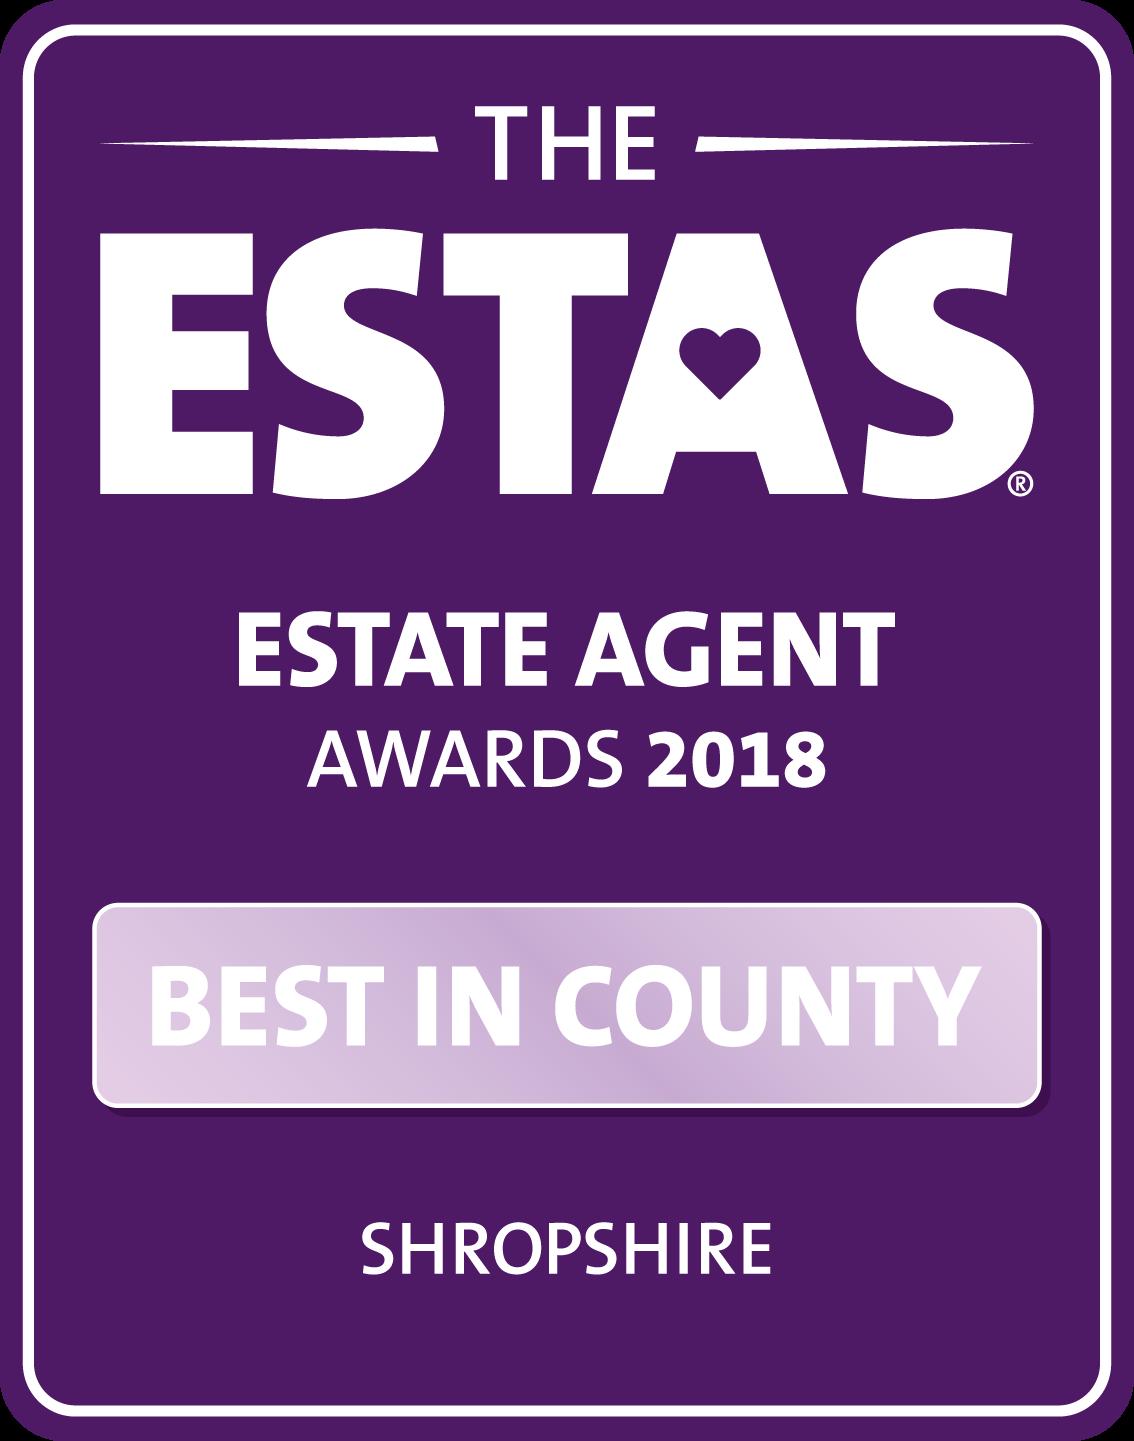 0168-estas-county-winners-logos-2018-ea_shrops_002